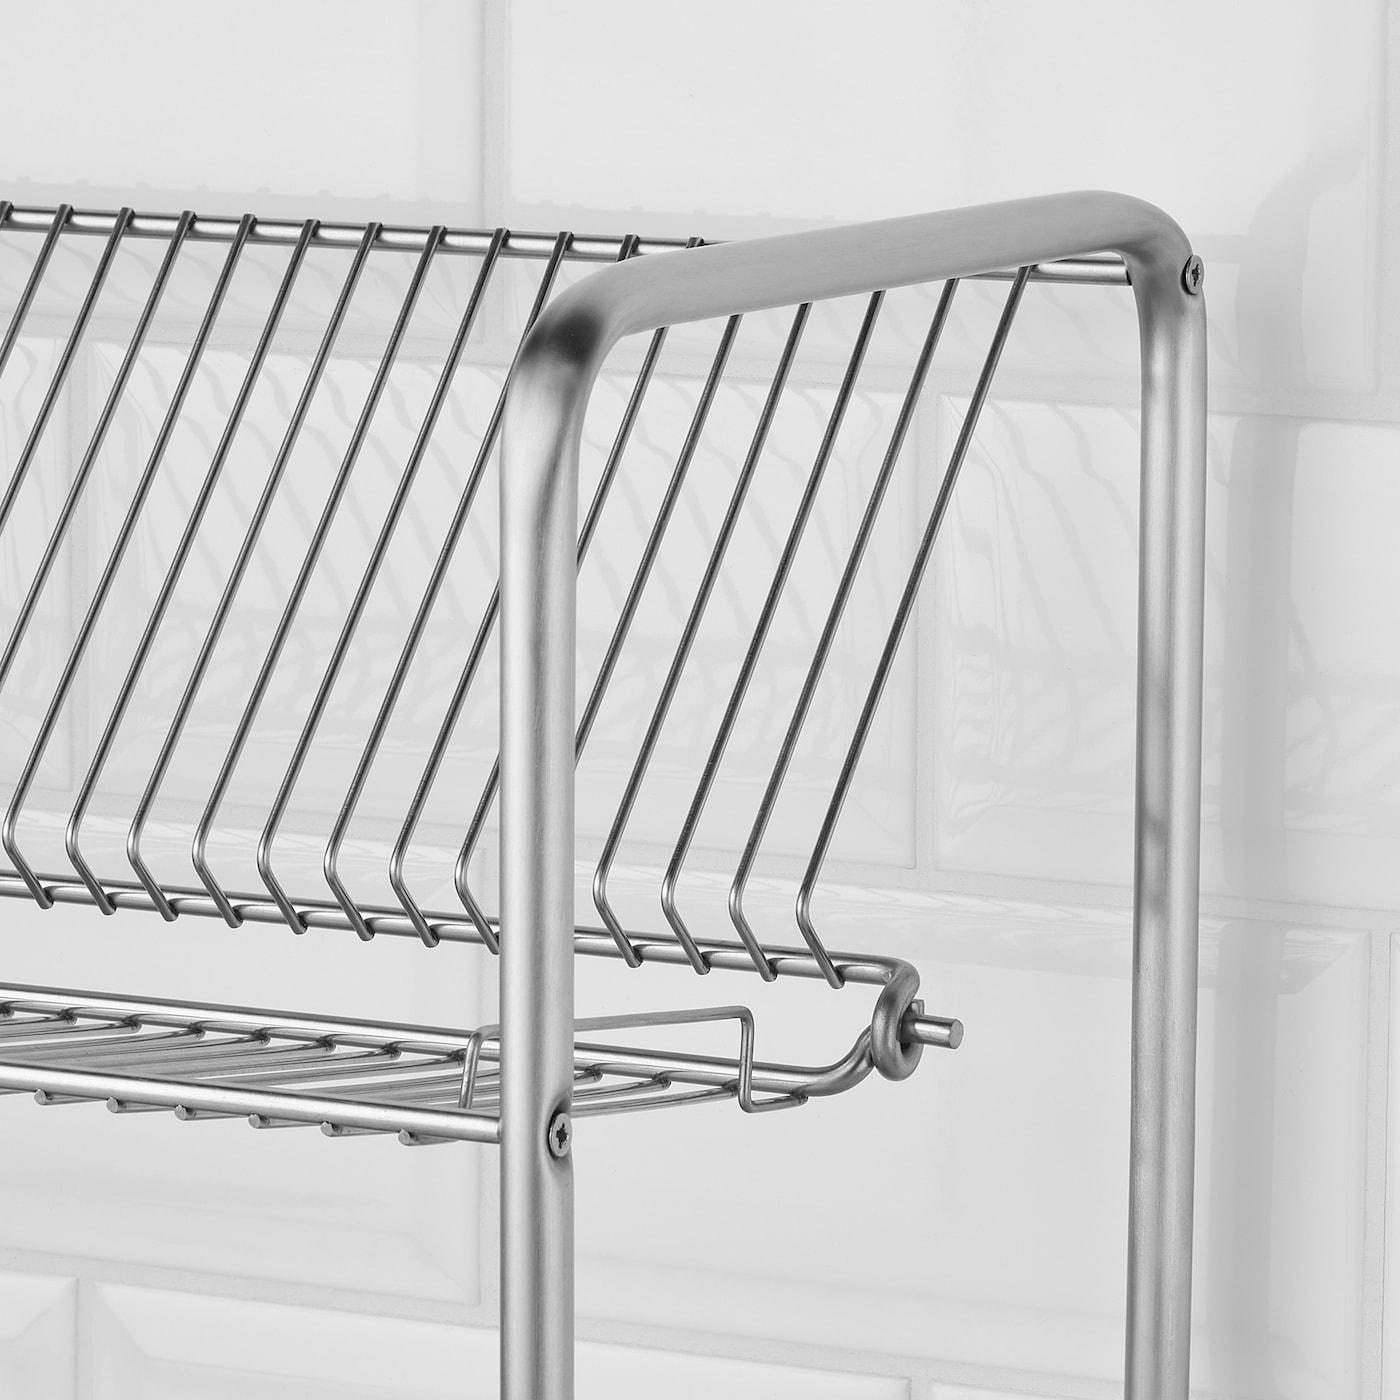 Ordning Dish Drainer Stainless Steel 19 5 8x10 5 8x14 1 8 50x27x36 Cm Ikea